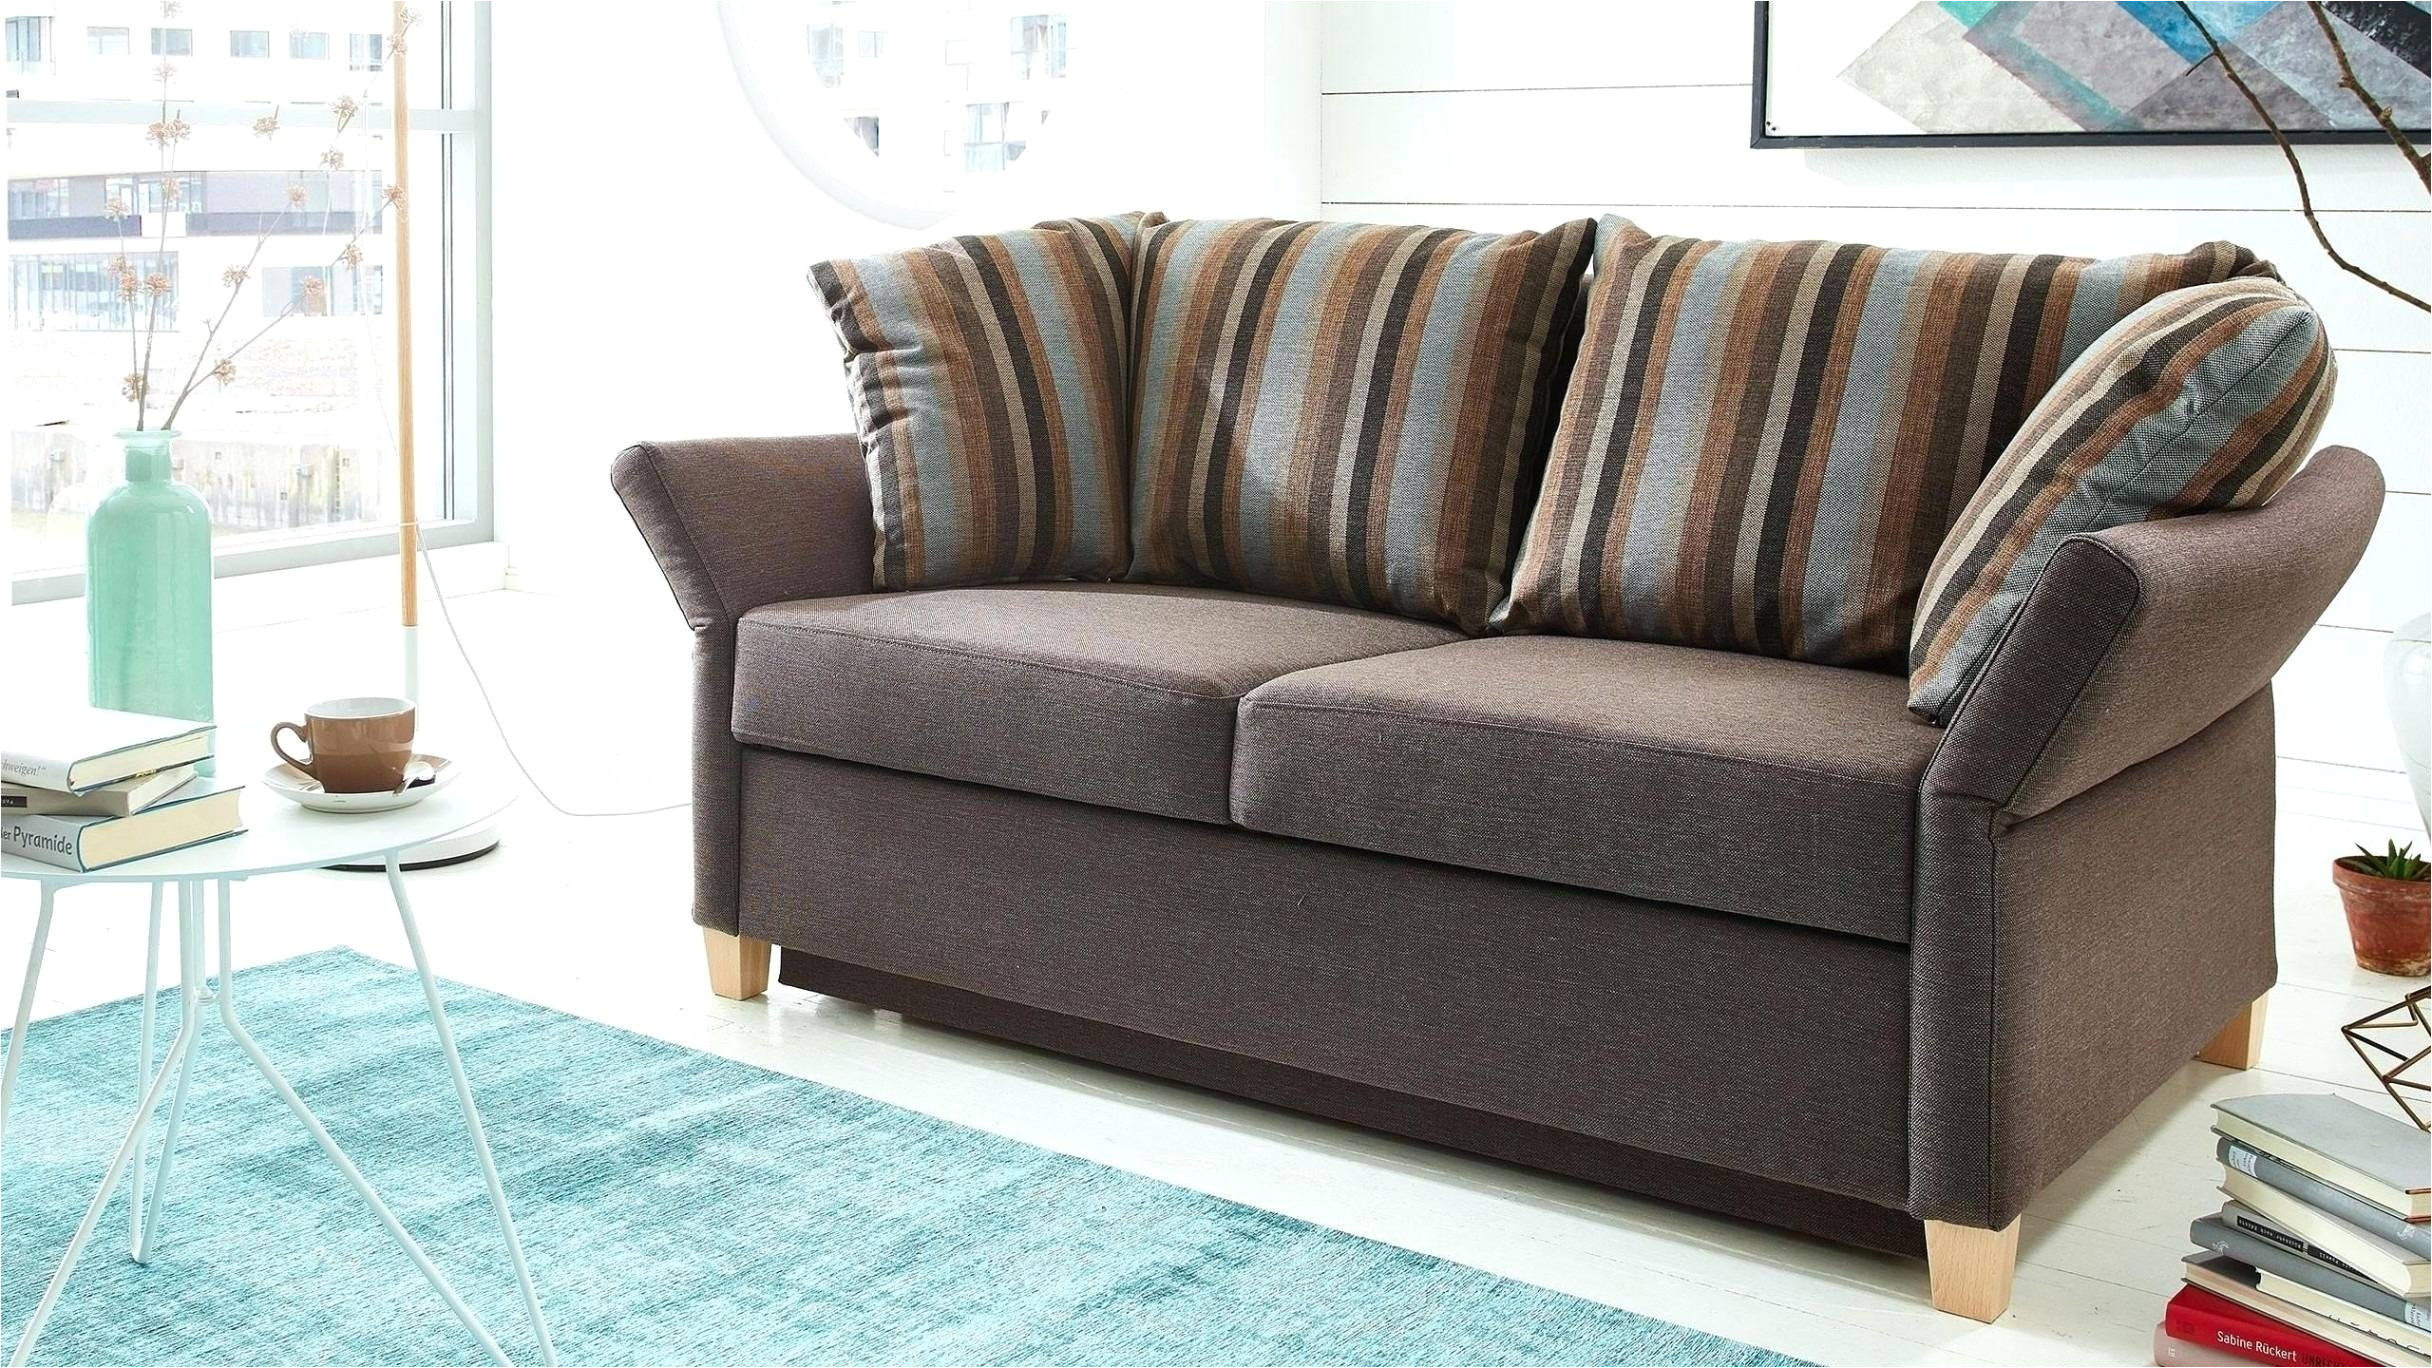 Diy Sectional sofa Frame Plans Diy Schlafsofa Beste Bett Mit sofa Schon sofa Bett tolle Furniture